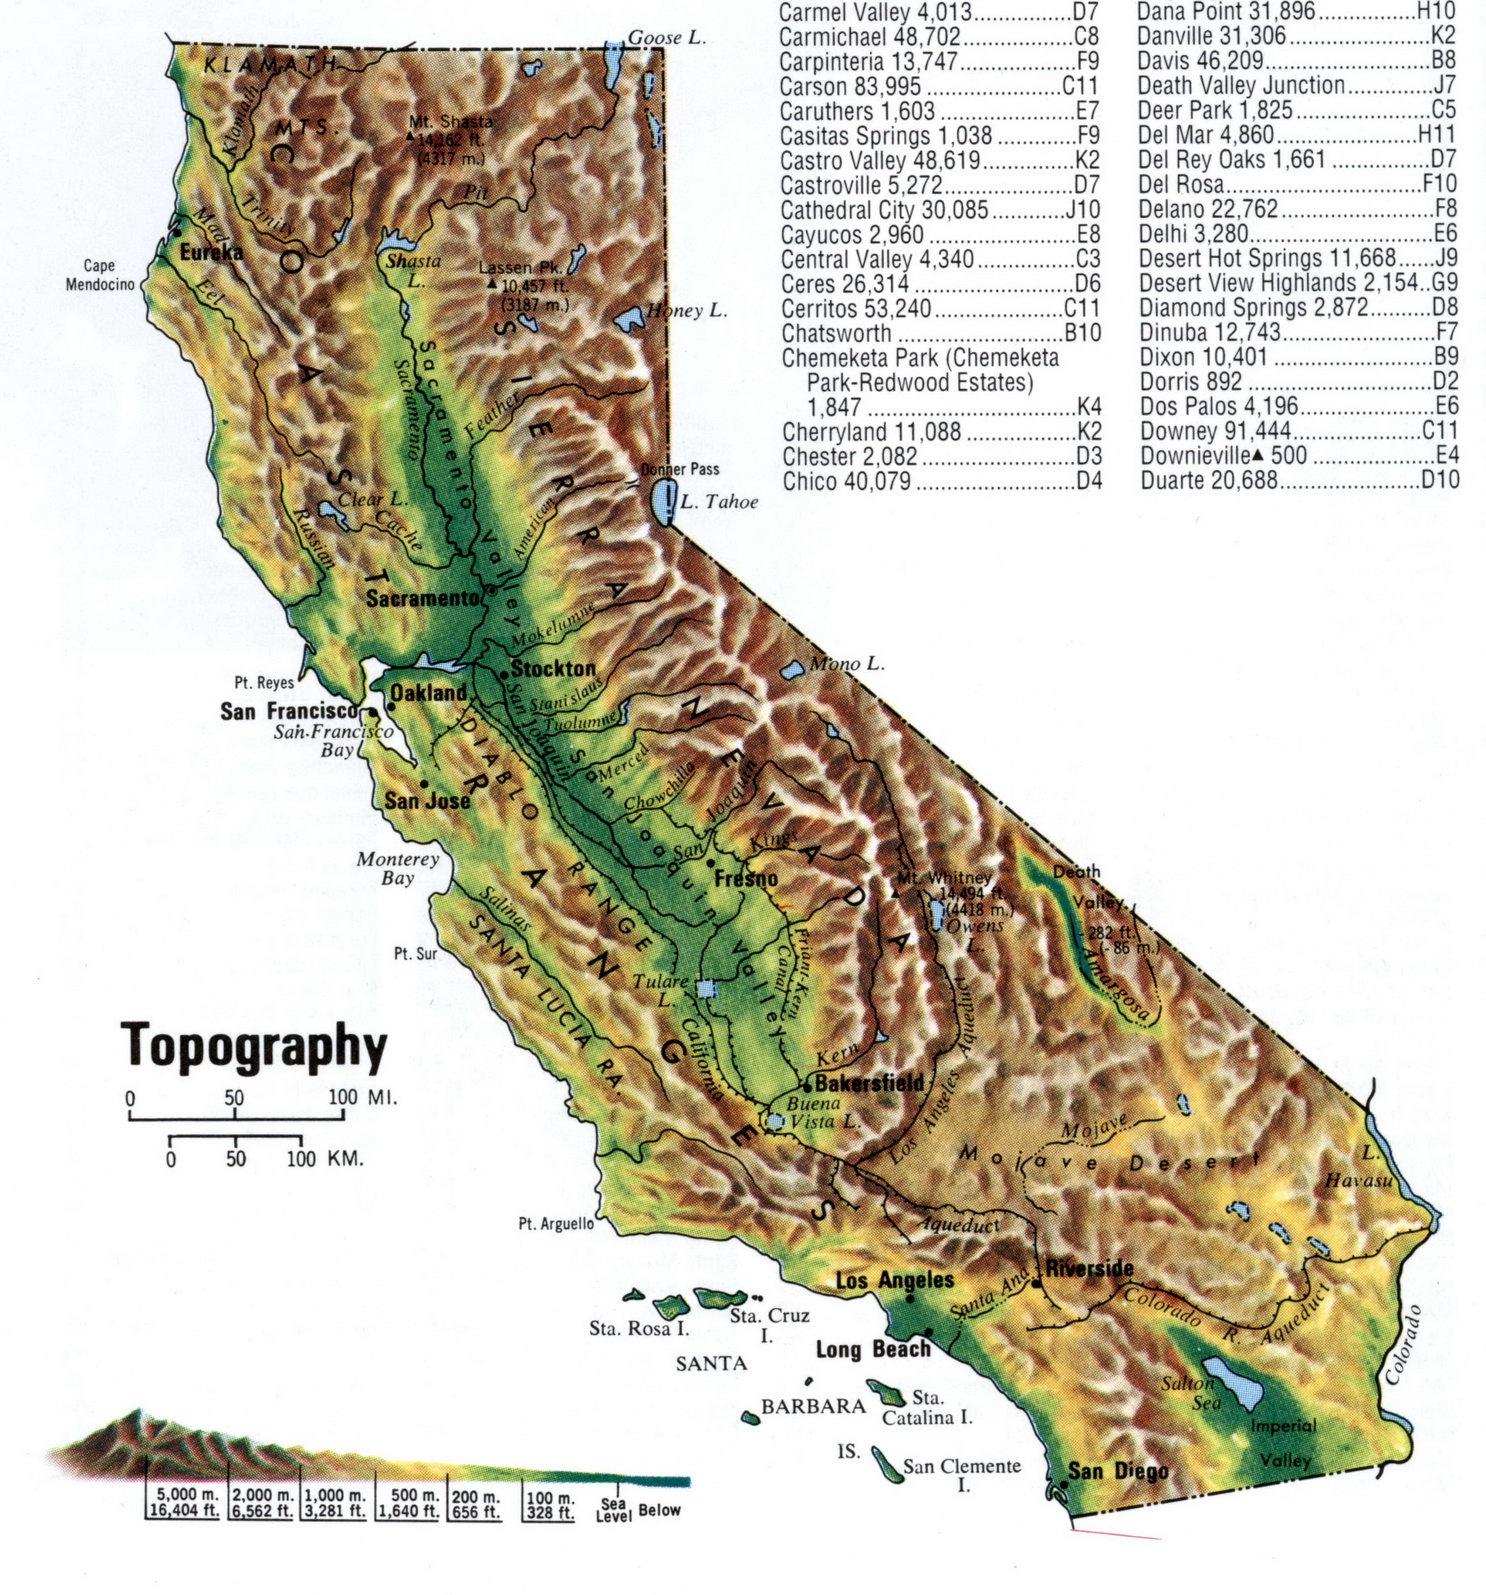 Topo Map California Topographic Maps Of California - Klipy - California Topographic Map Index